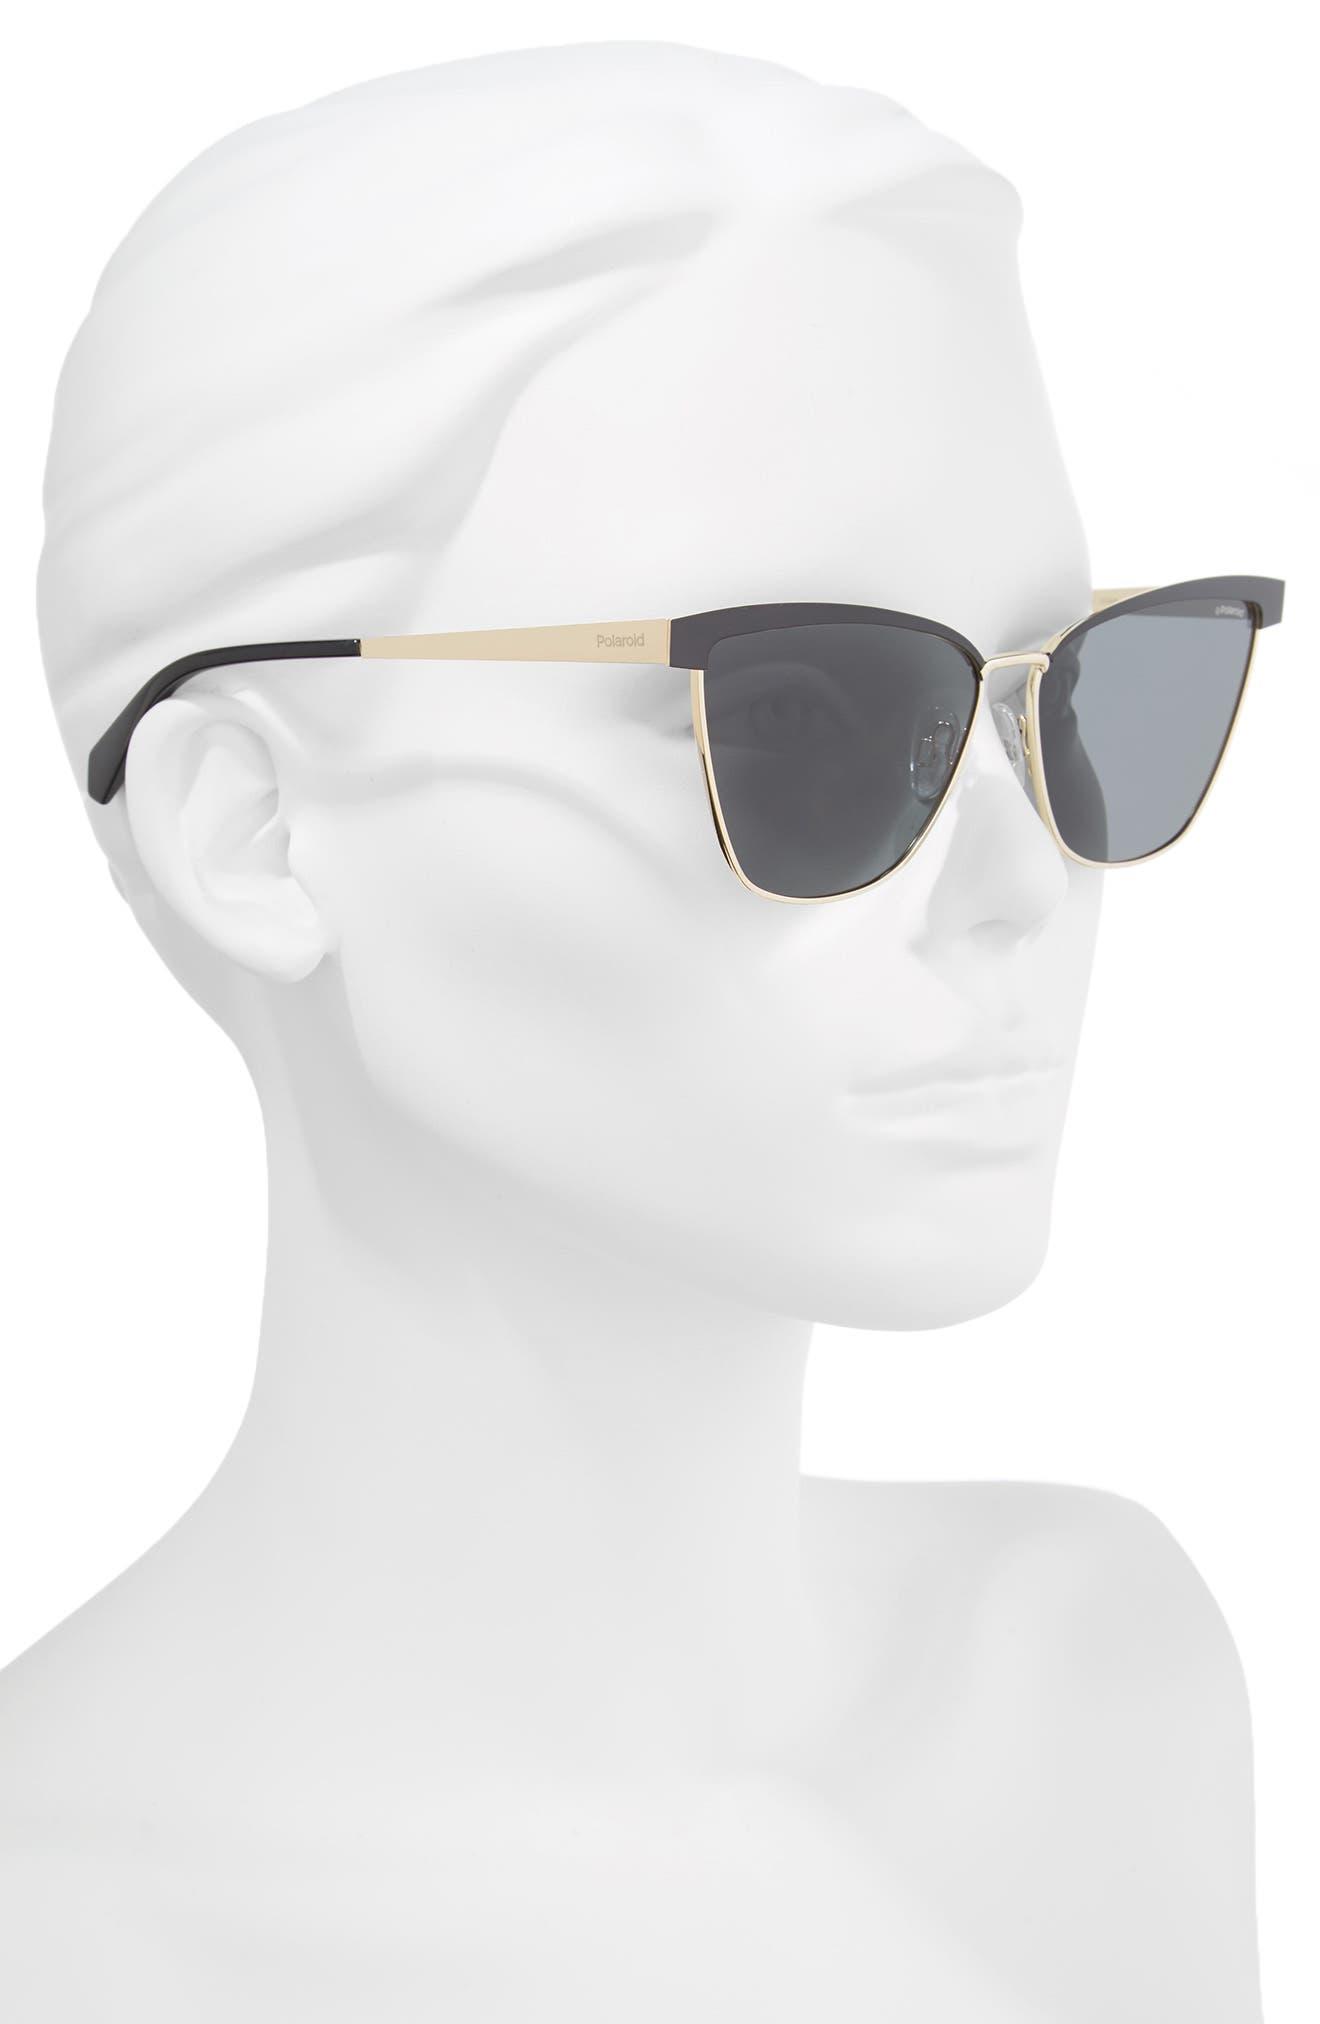 60mm Polarized Cat Eye Sunglasses,                             Alternate thumbnail 3, color,